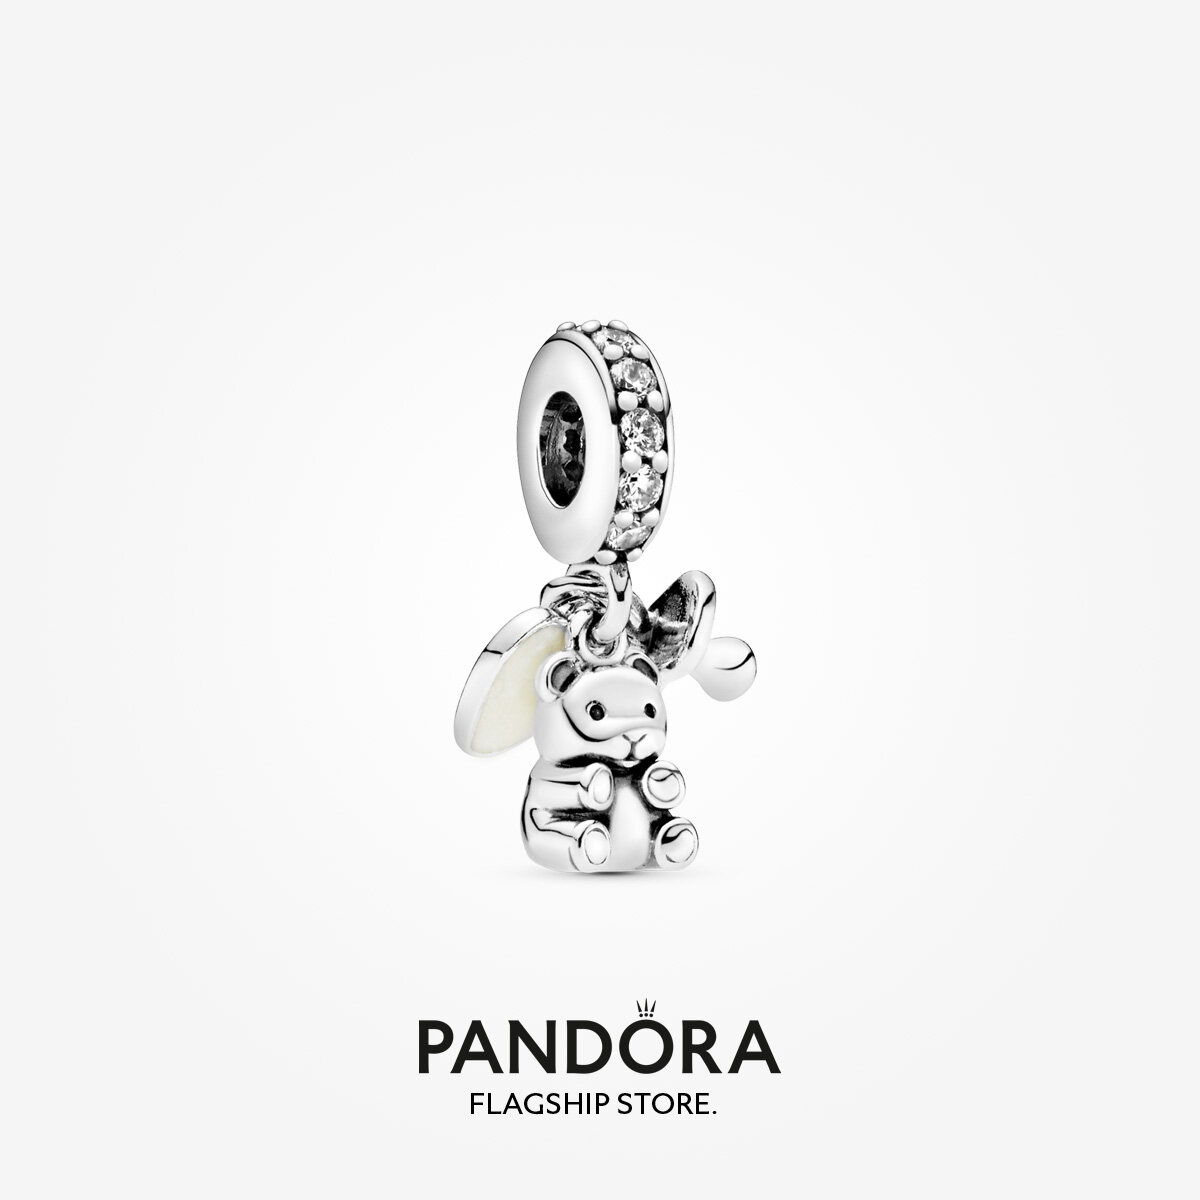 Beli Pandora Bracelet For Baby Pada Harga Terendah Lazada Com My